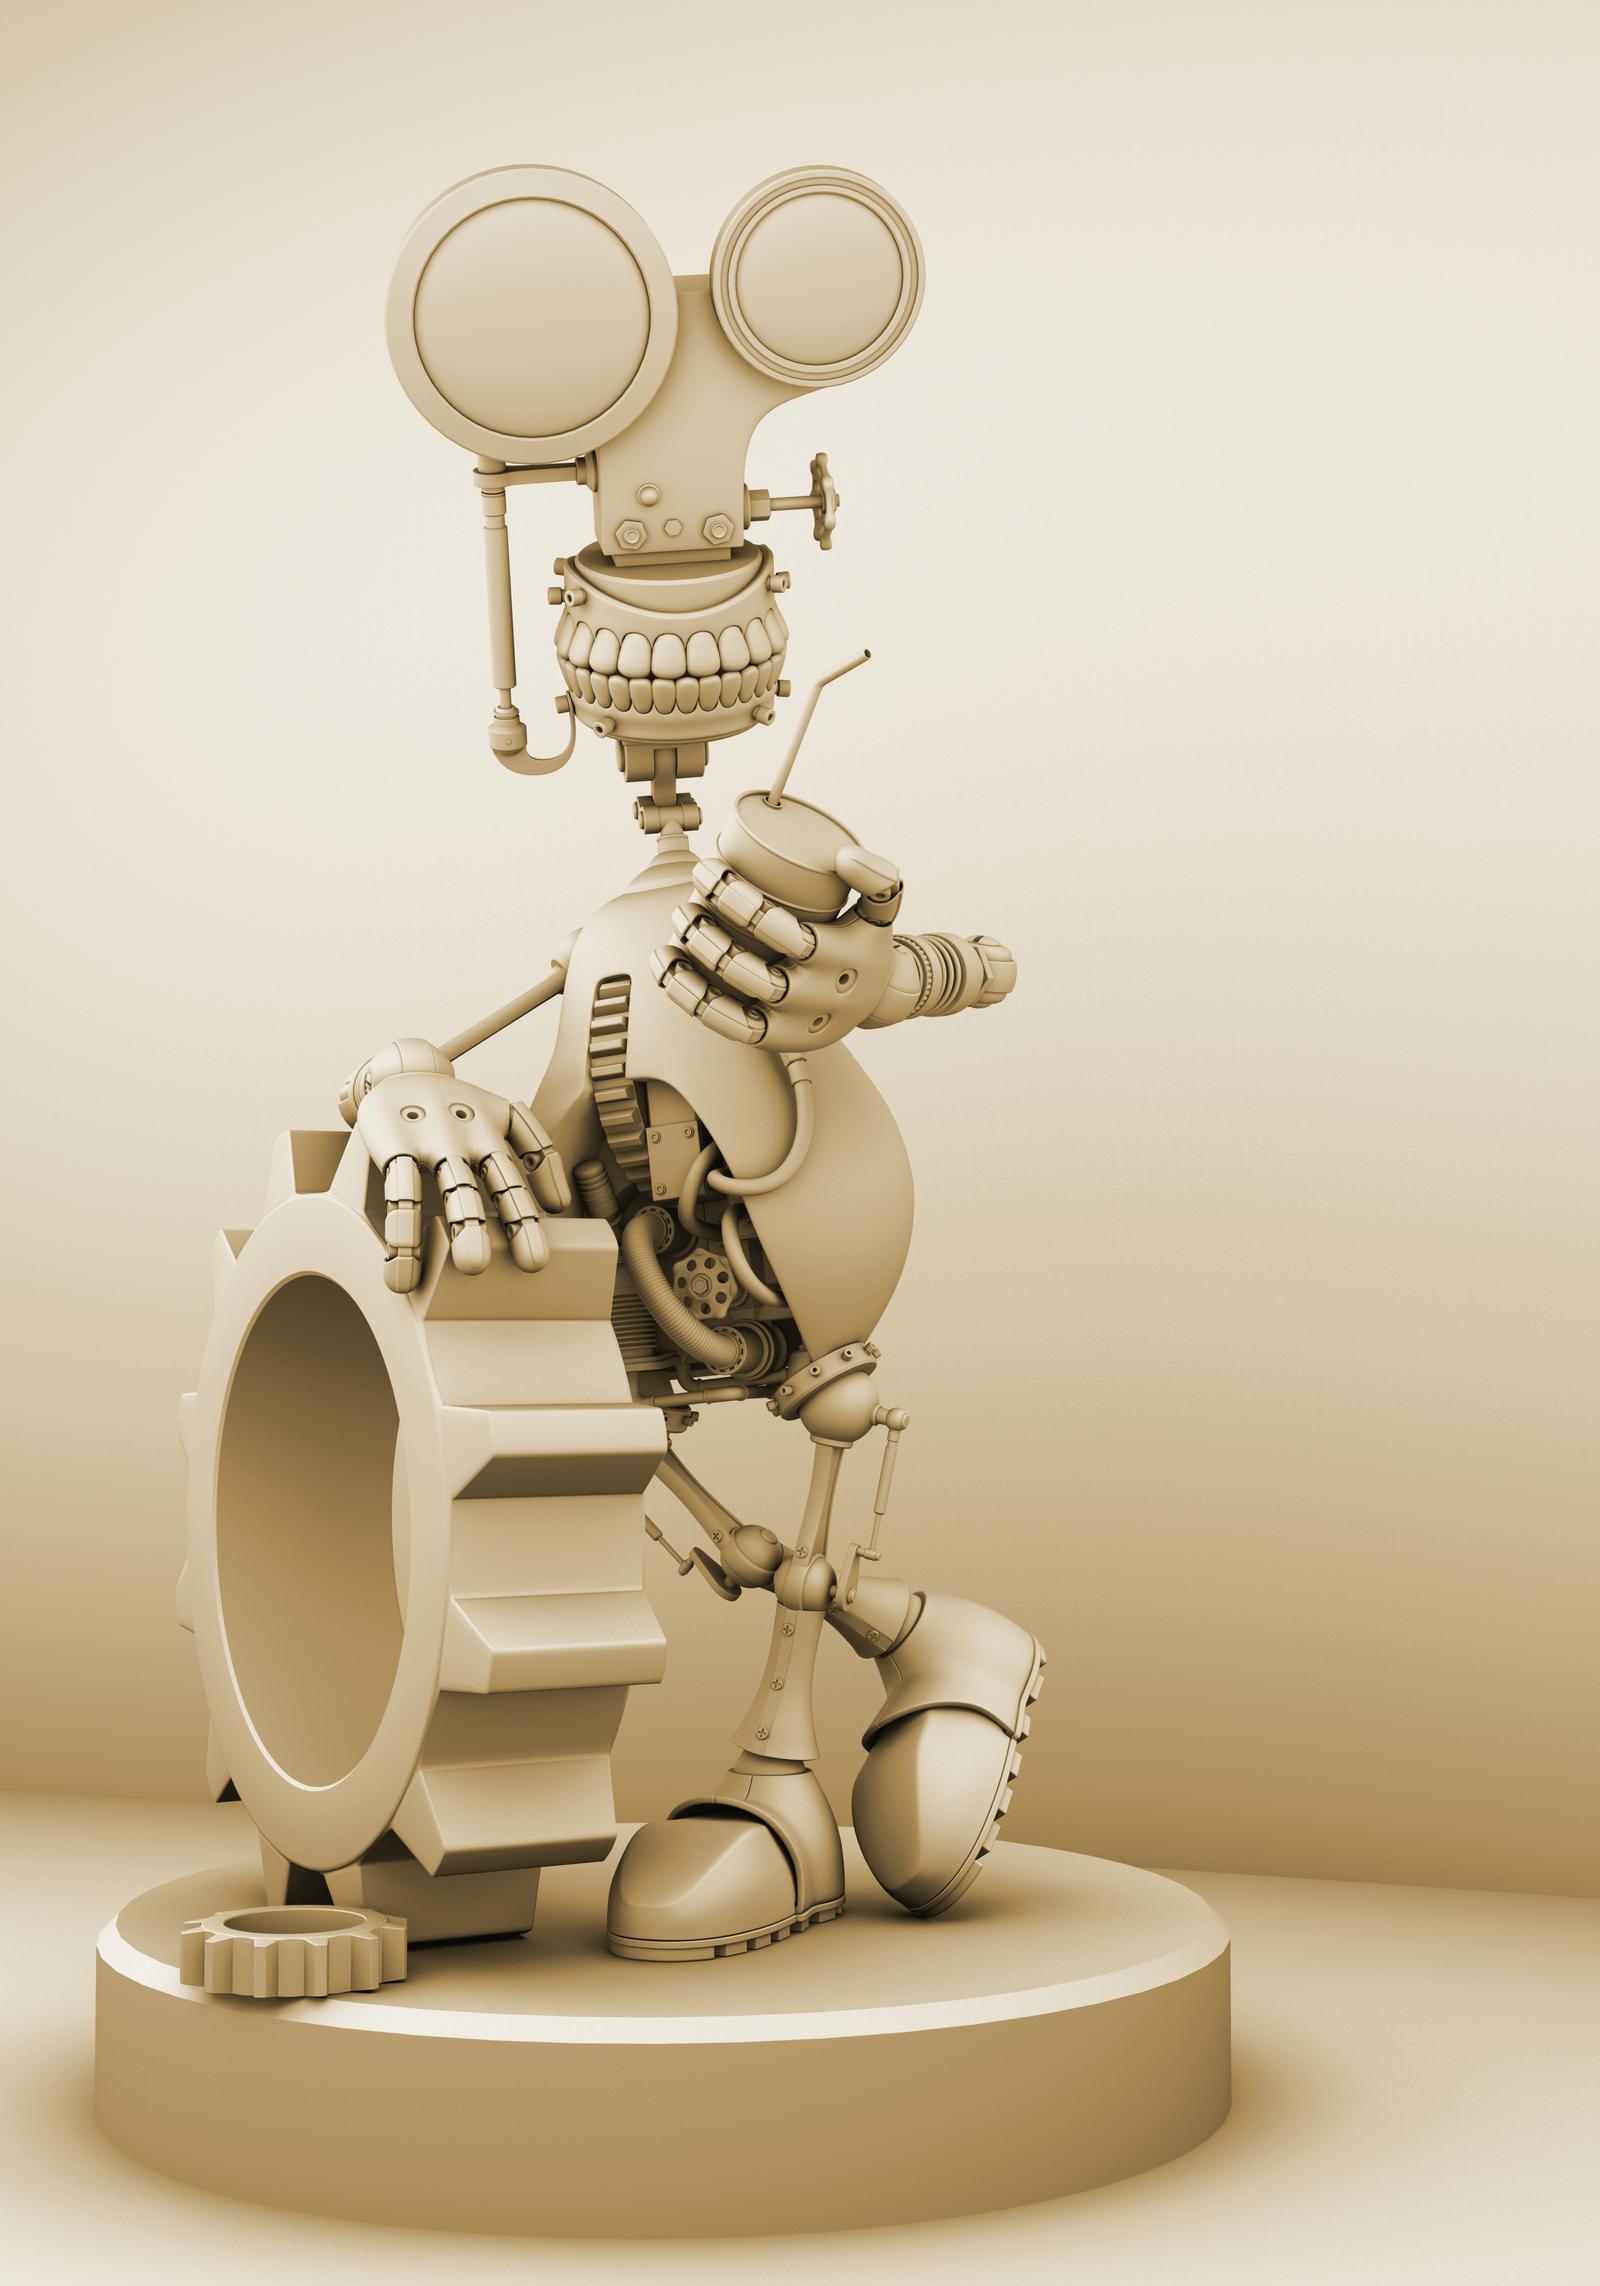 Robot copy by hongrenjoe